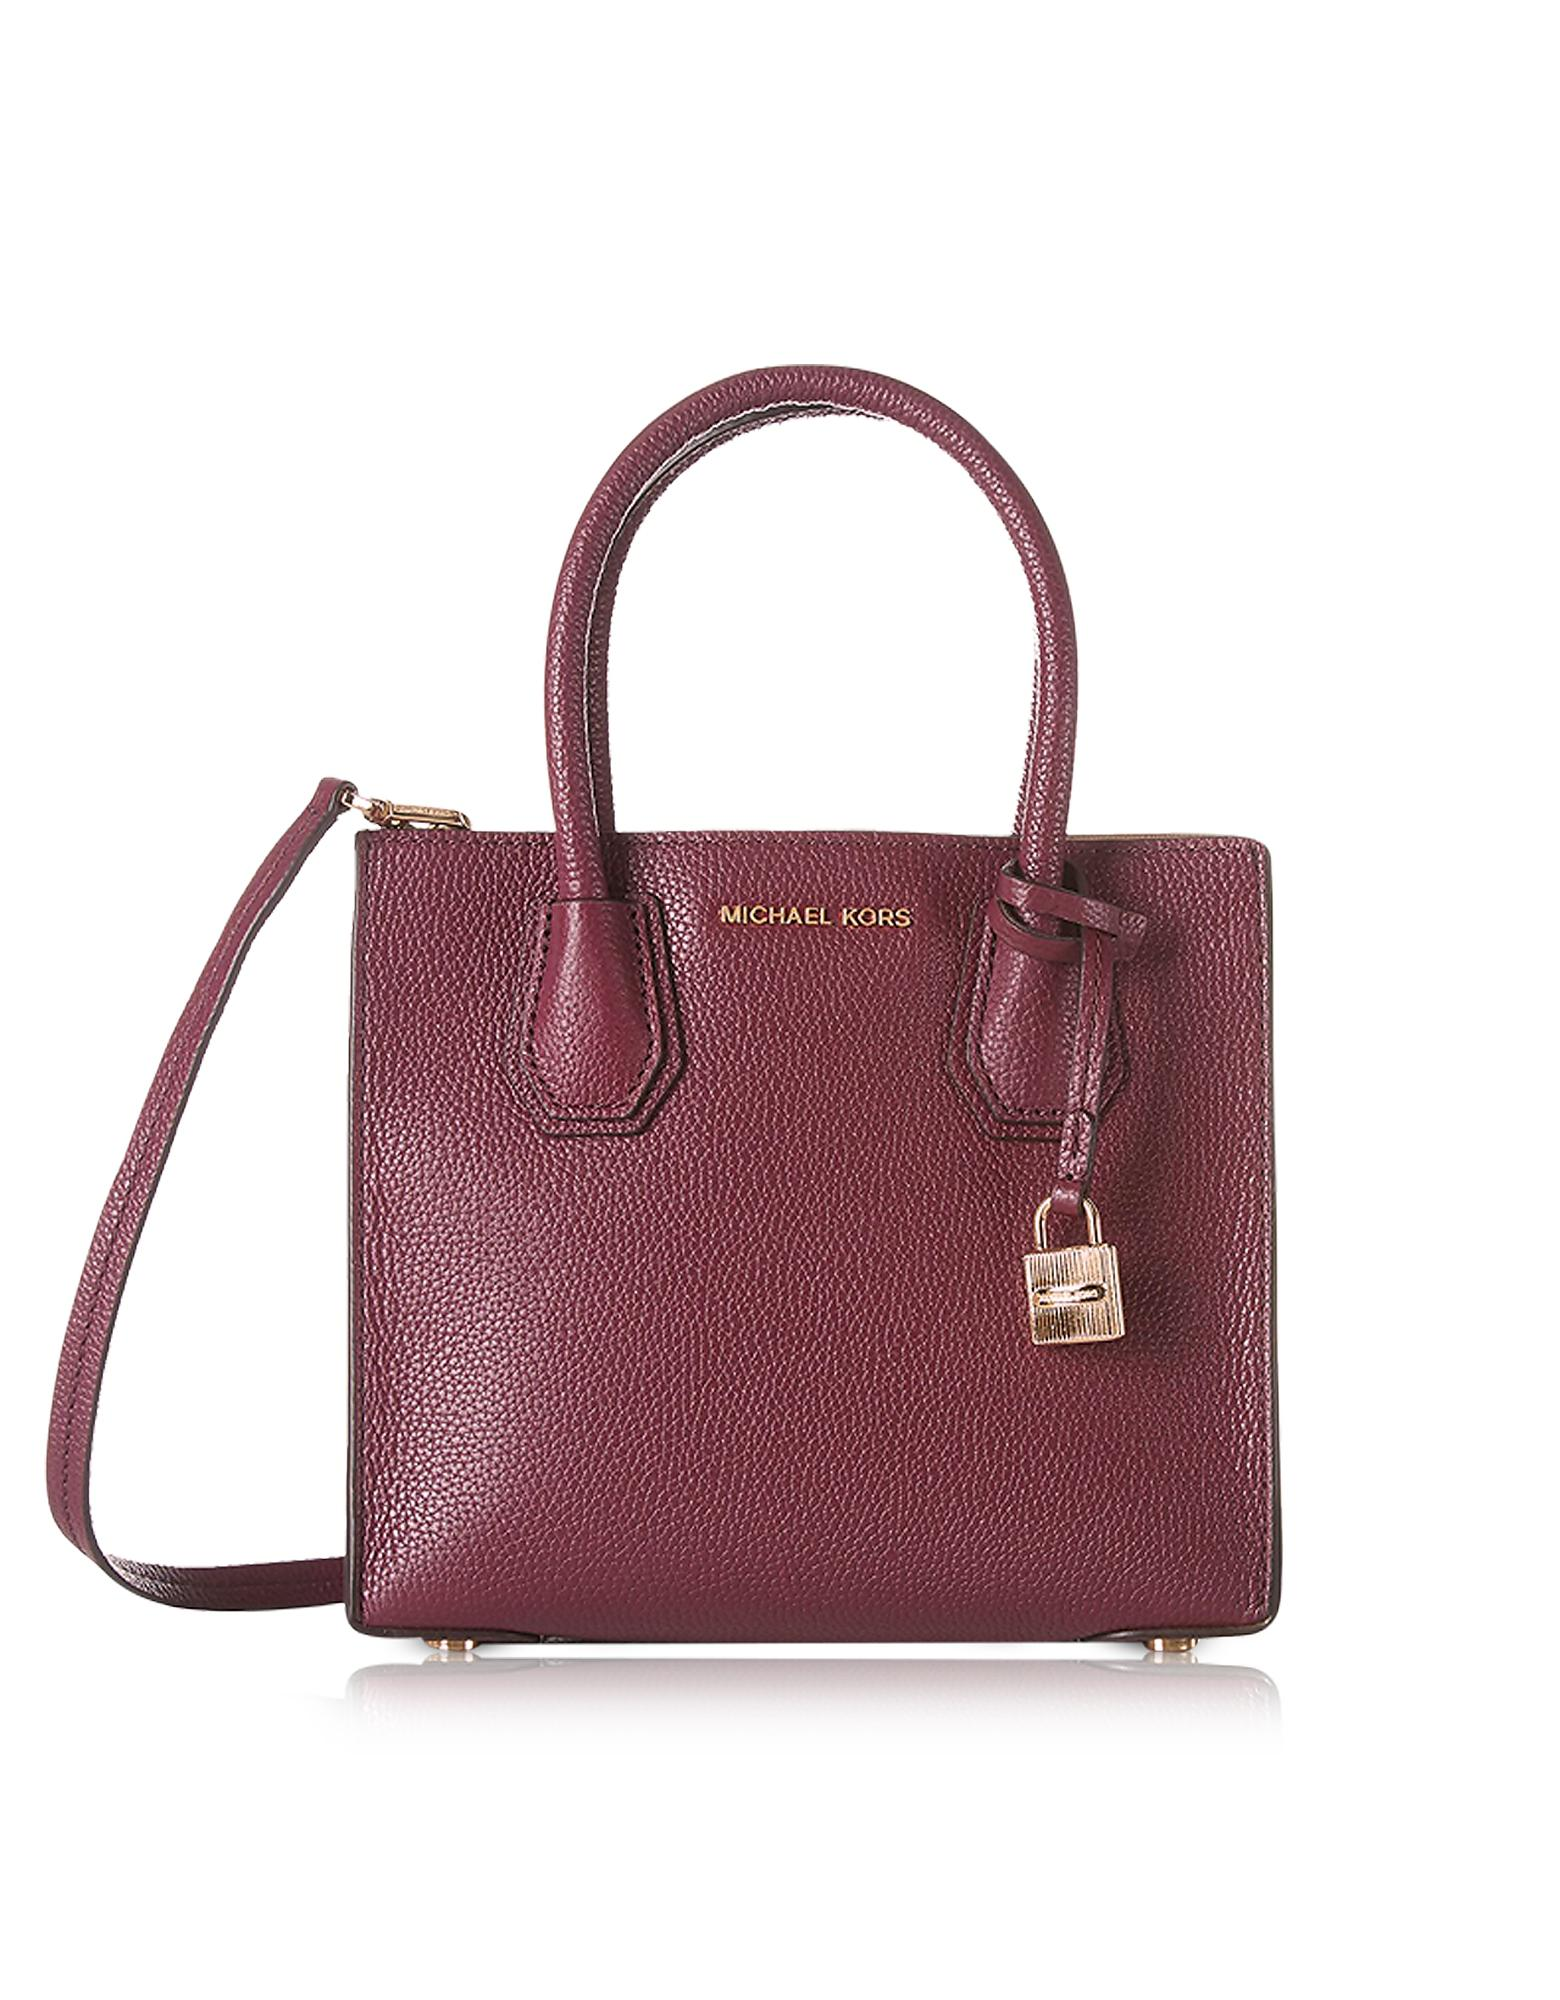 3165be34b4a1 Michael Kors Mercer Medium Mulberry Pebble Leather Crossbody Bag in ...